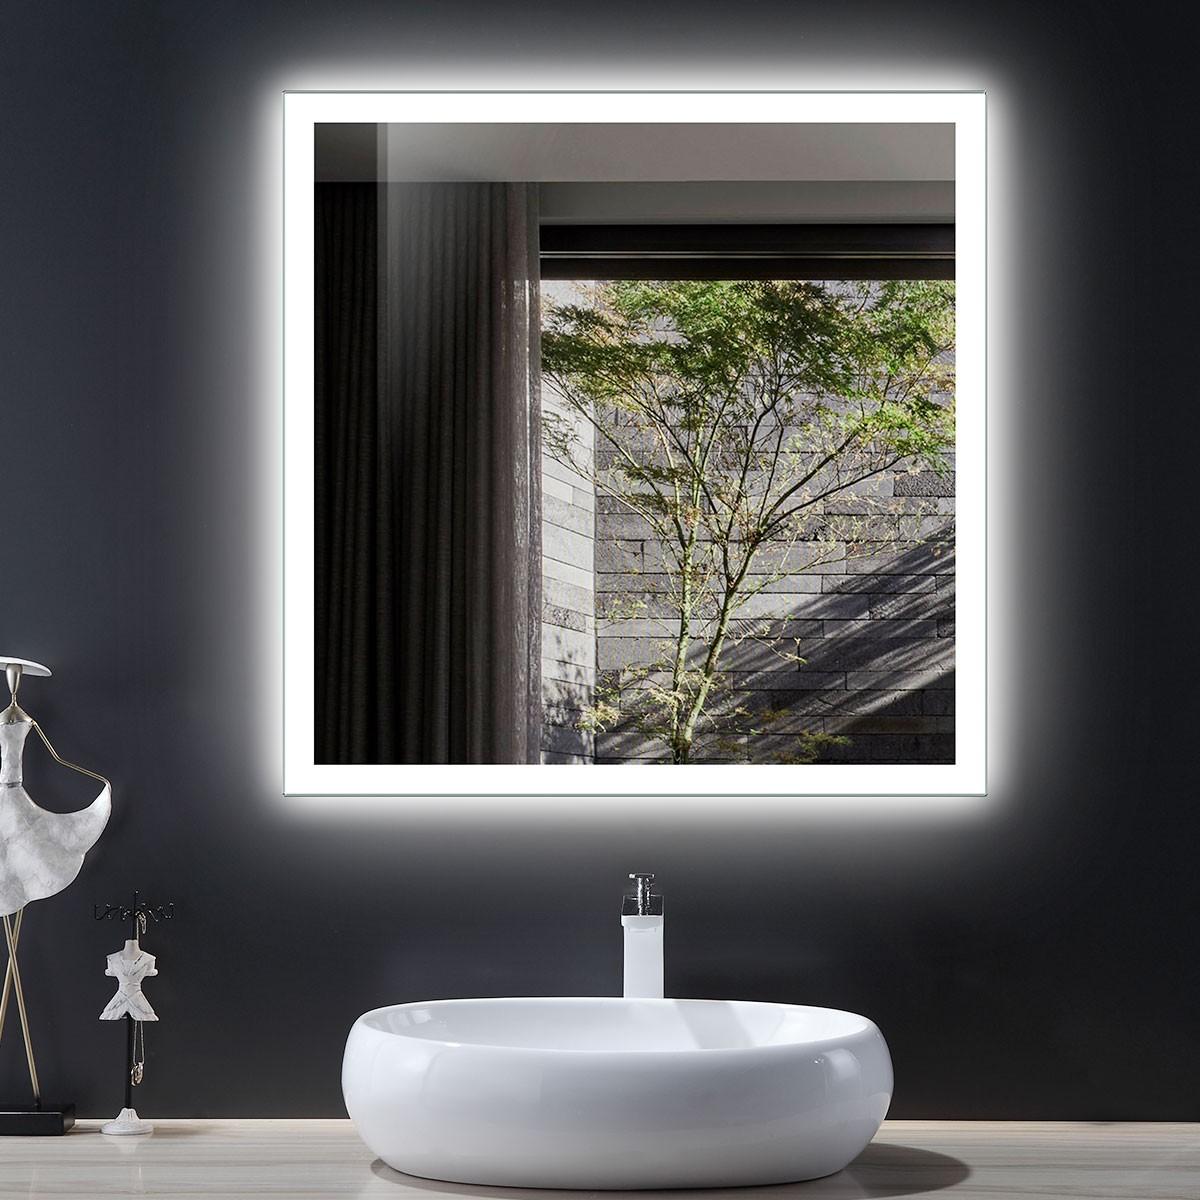 36 x 36 po miroir de salle de bain LED avec capteur infrarouge (DK-OD-N031-EG)